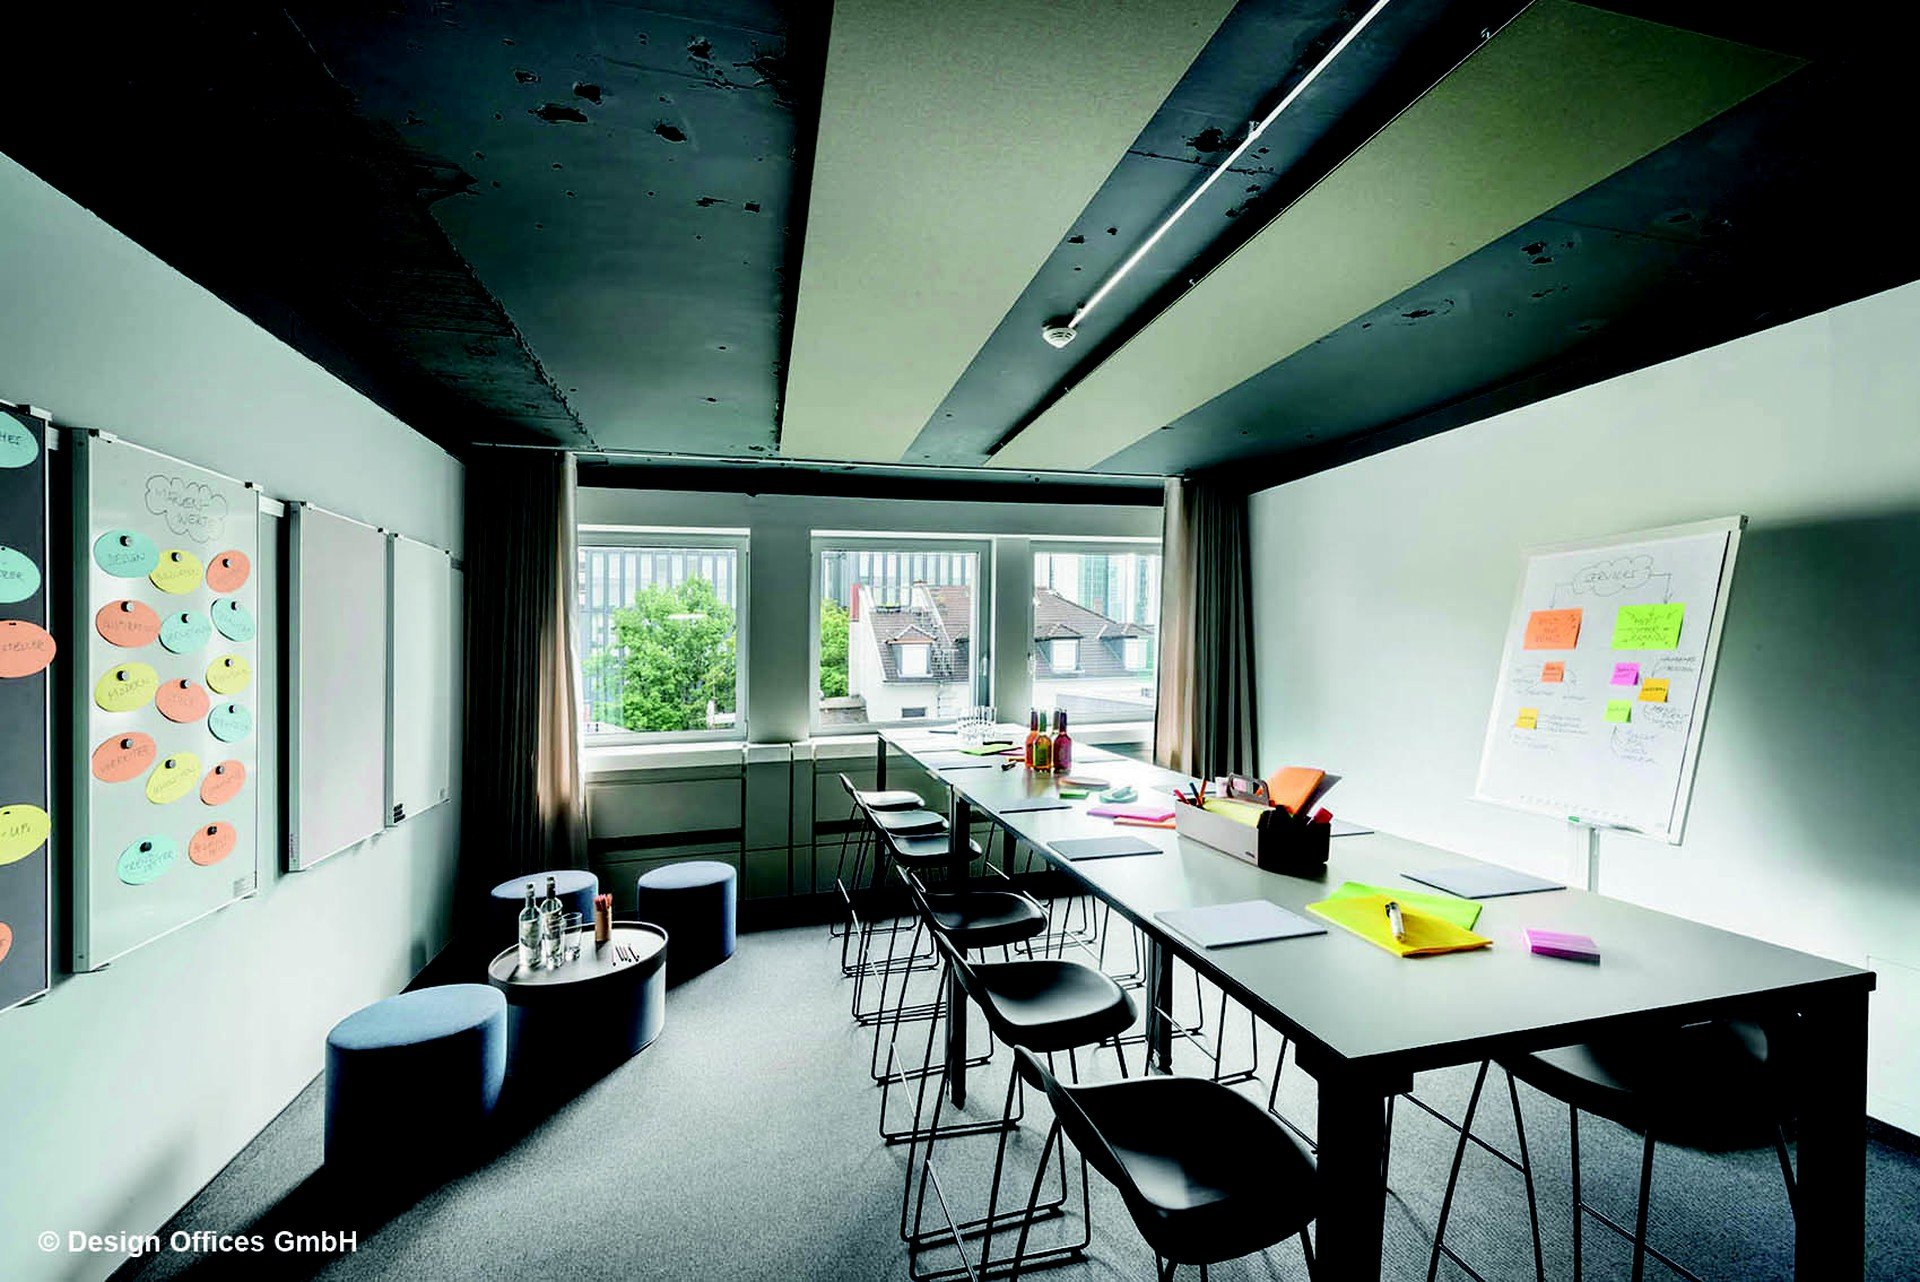 Frankfurt am Main training rooms Meetingraum Design Offices FFM - Meet and Move Room image 1